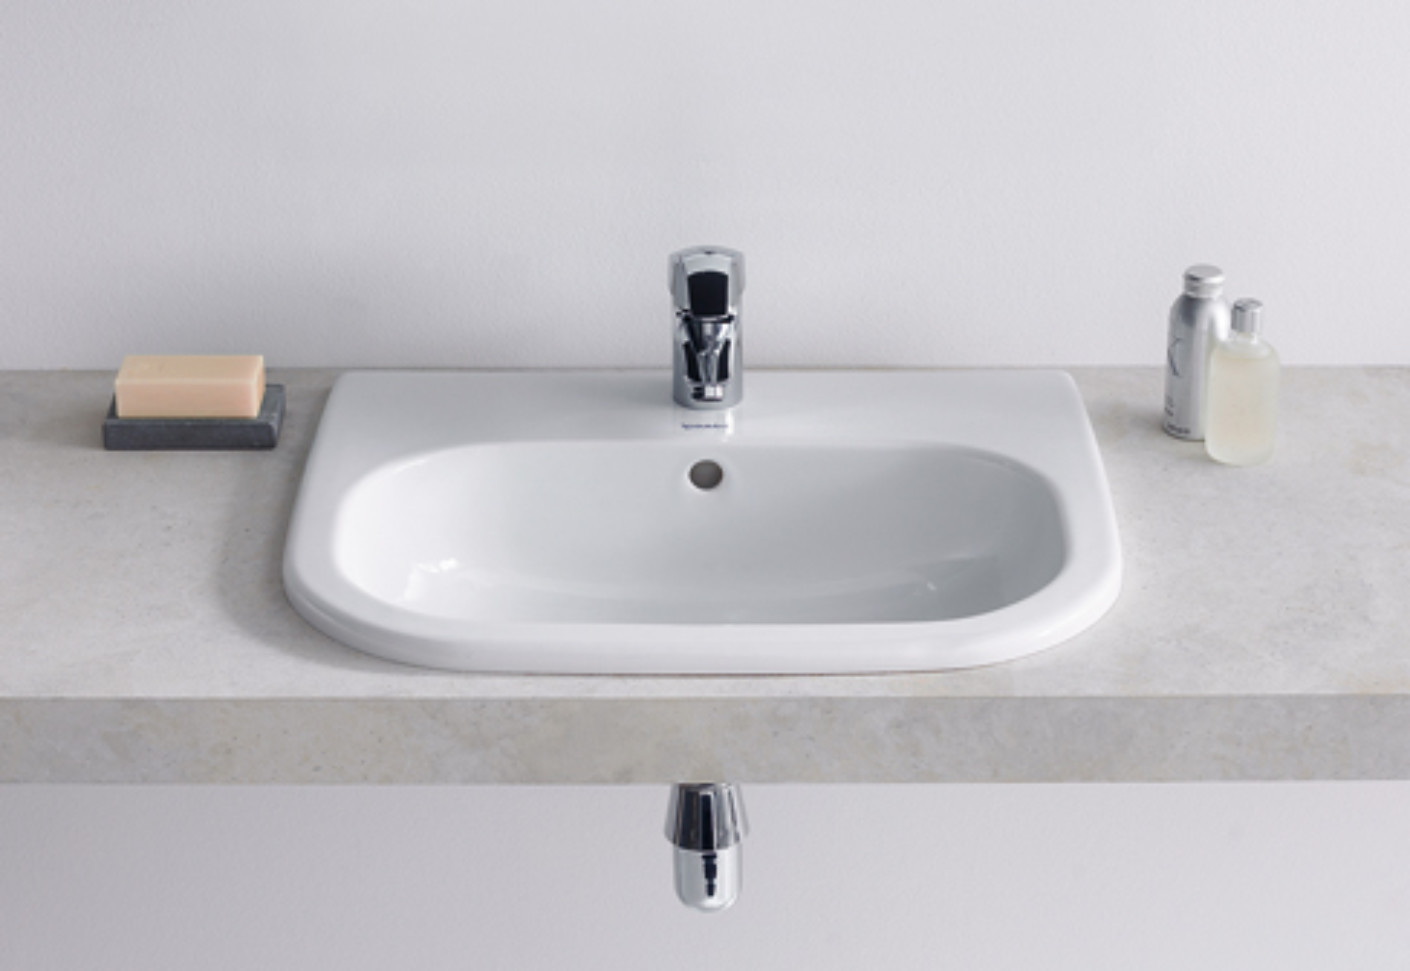 kitchen swivel chairs swedish knives d-code vanity basin by duravit | stylepark